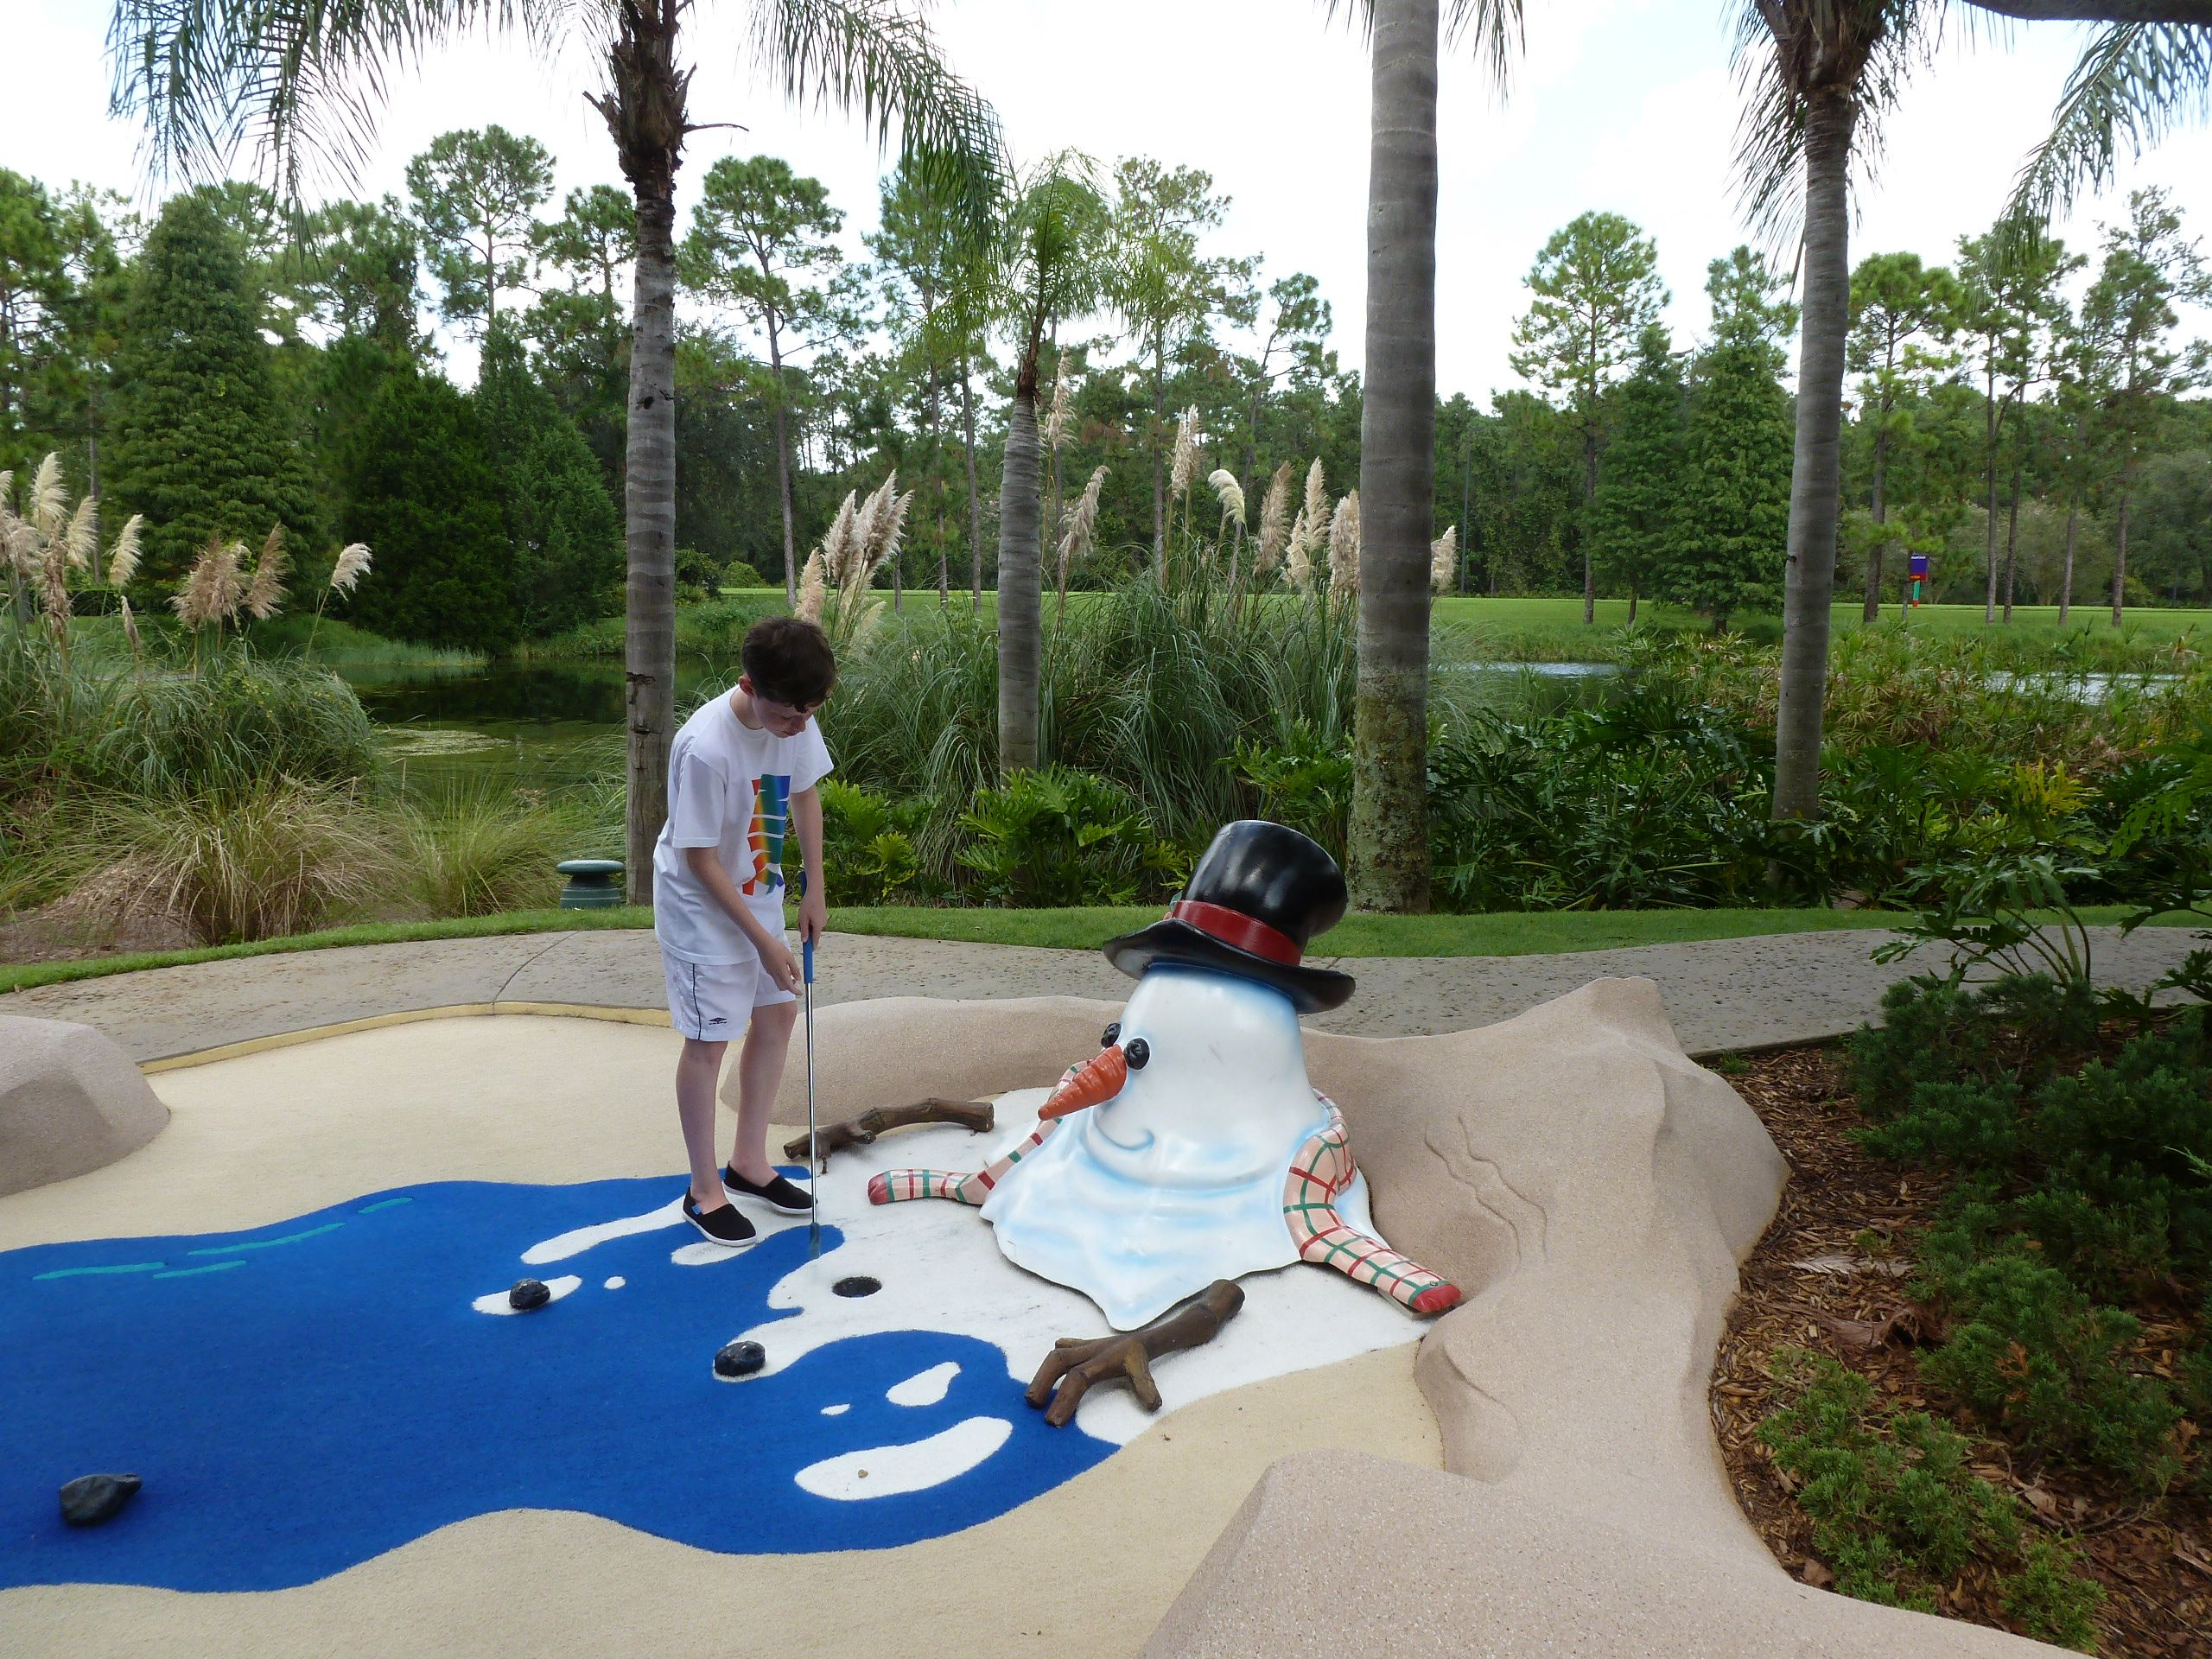 Pin By Liliane Opsomer On Wdw Mini Golf Disney Quest Coronado Springs Resort Disney Disney Quest Coronado Springs Resort